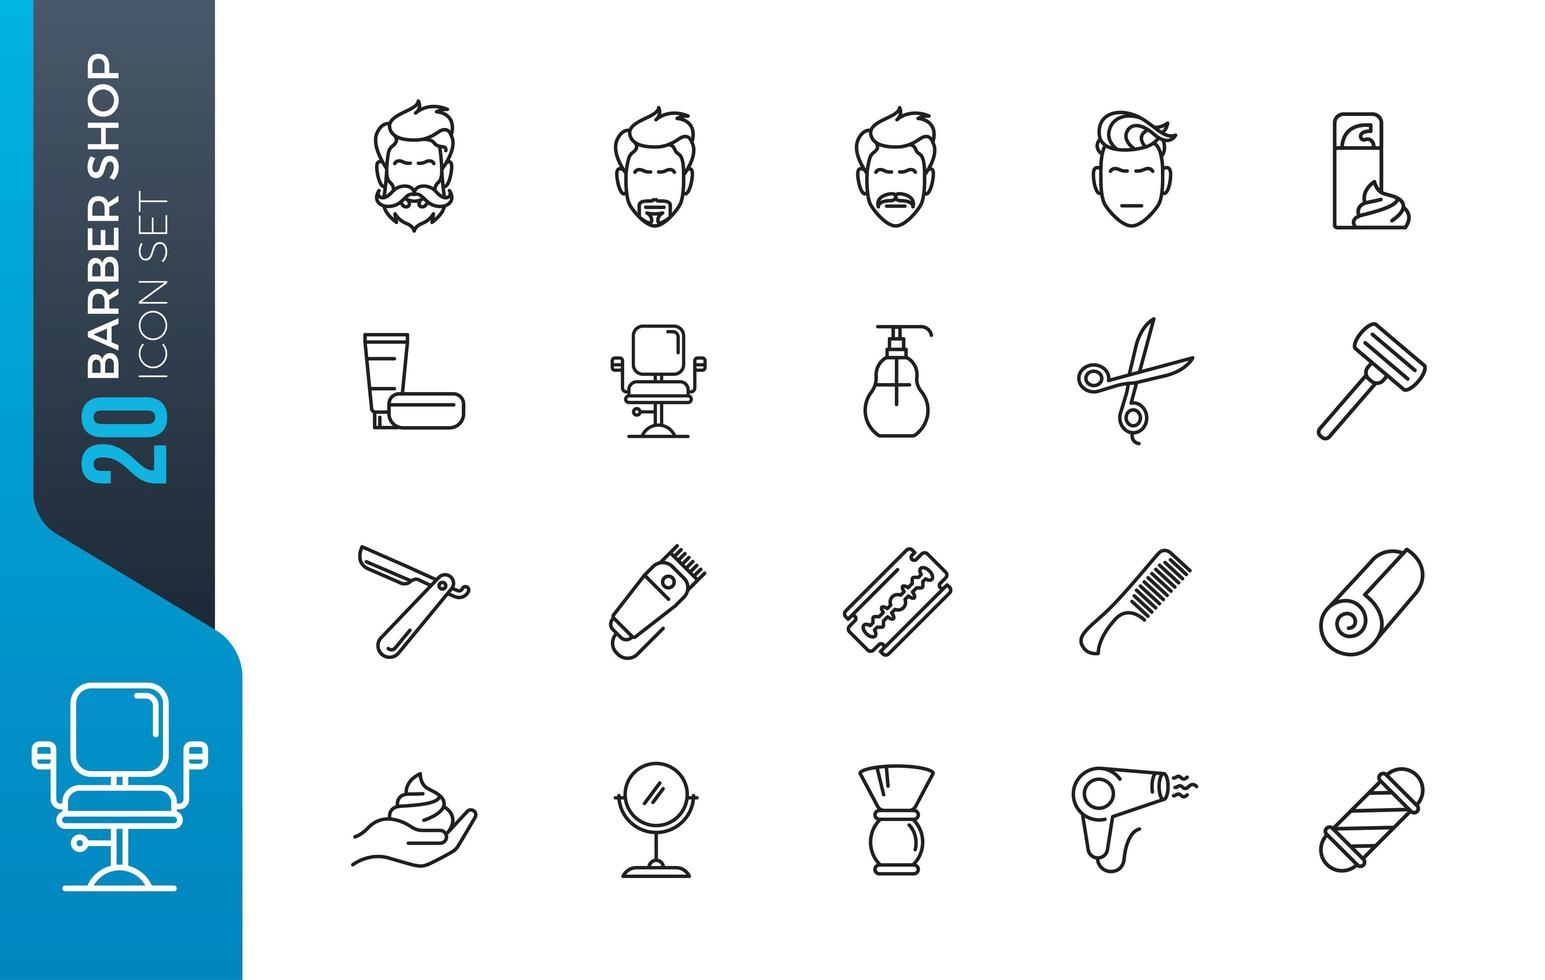 jeu d'icônes de salon de coiffure vecteur